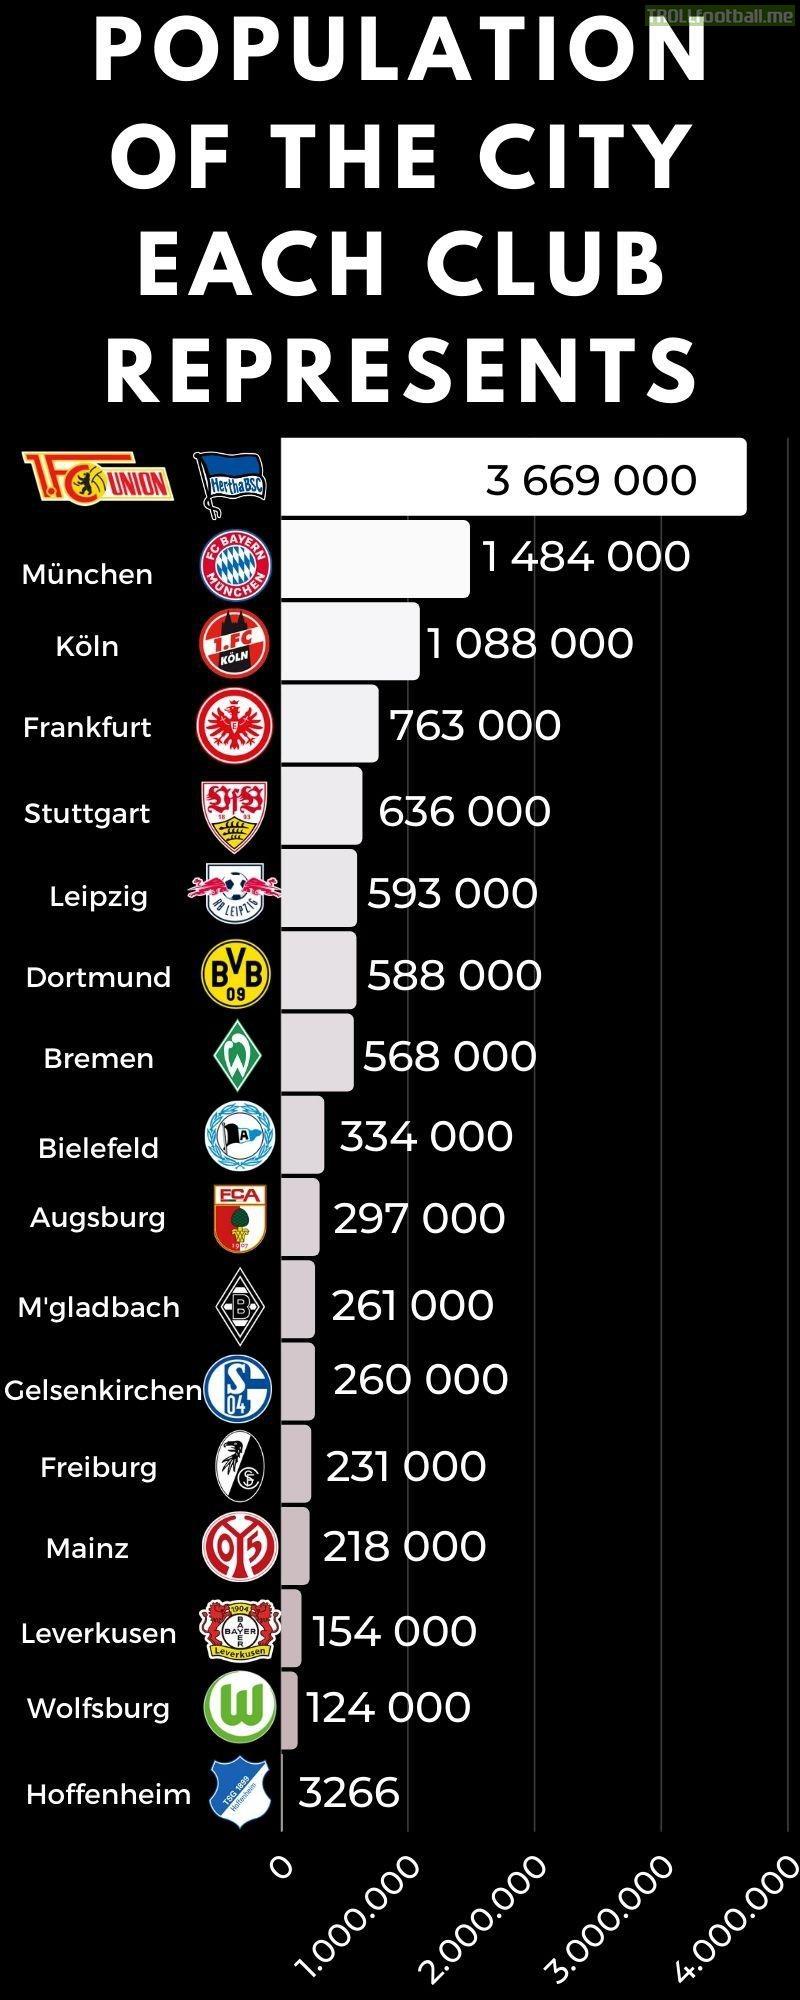 [OC] Population of the city each Bundesliga club represents